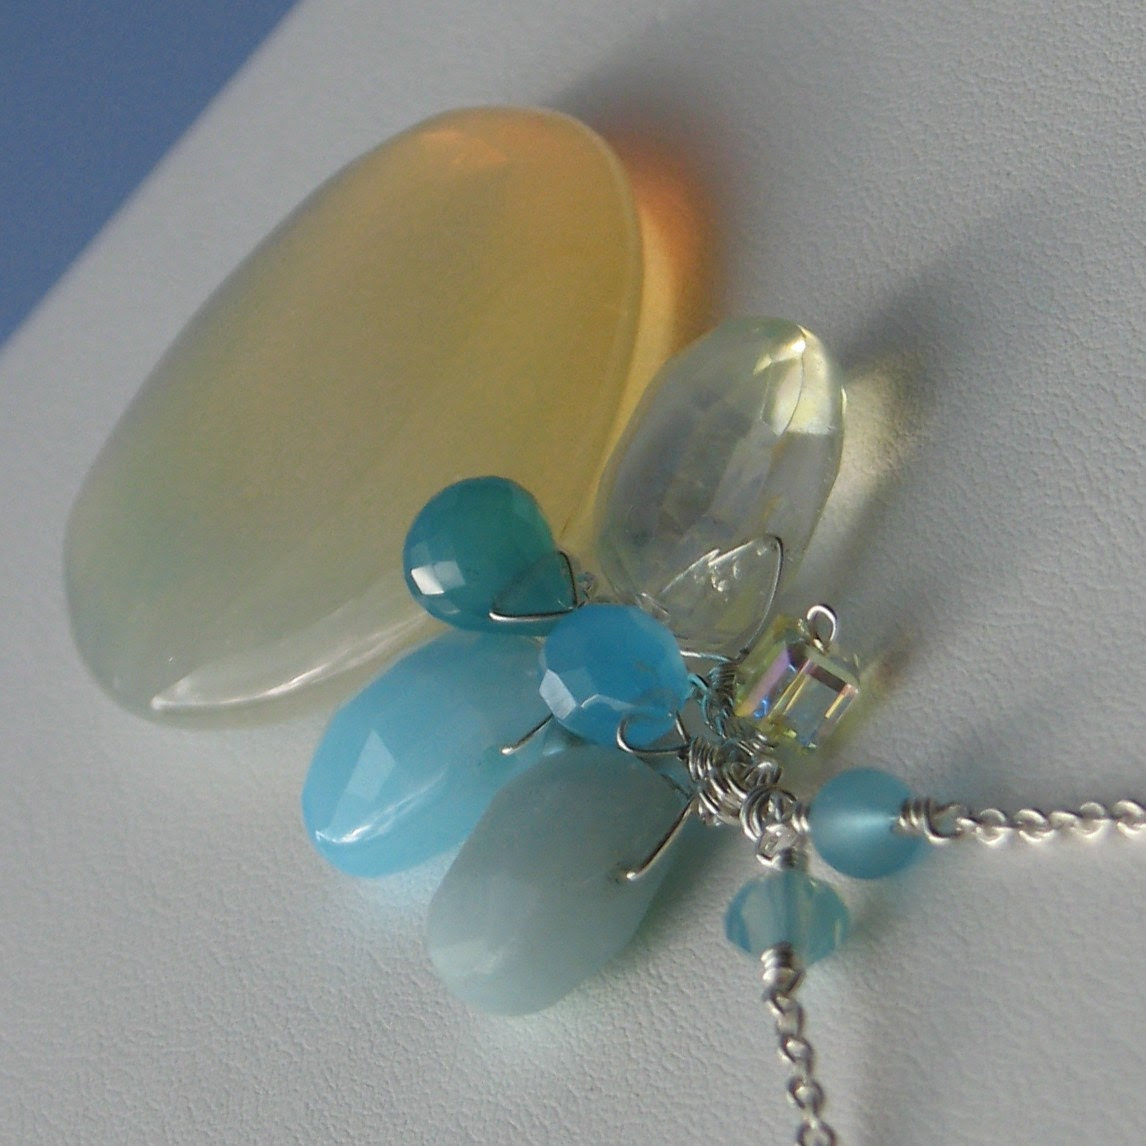 Beach Beauty, Sea Blue Chalcedony, Lemon Quartz, Swarovski Crystals, Teal Freshwater Pearls, Sterling Silver Necklace